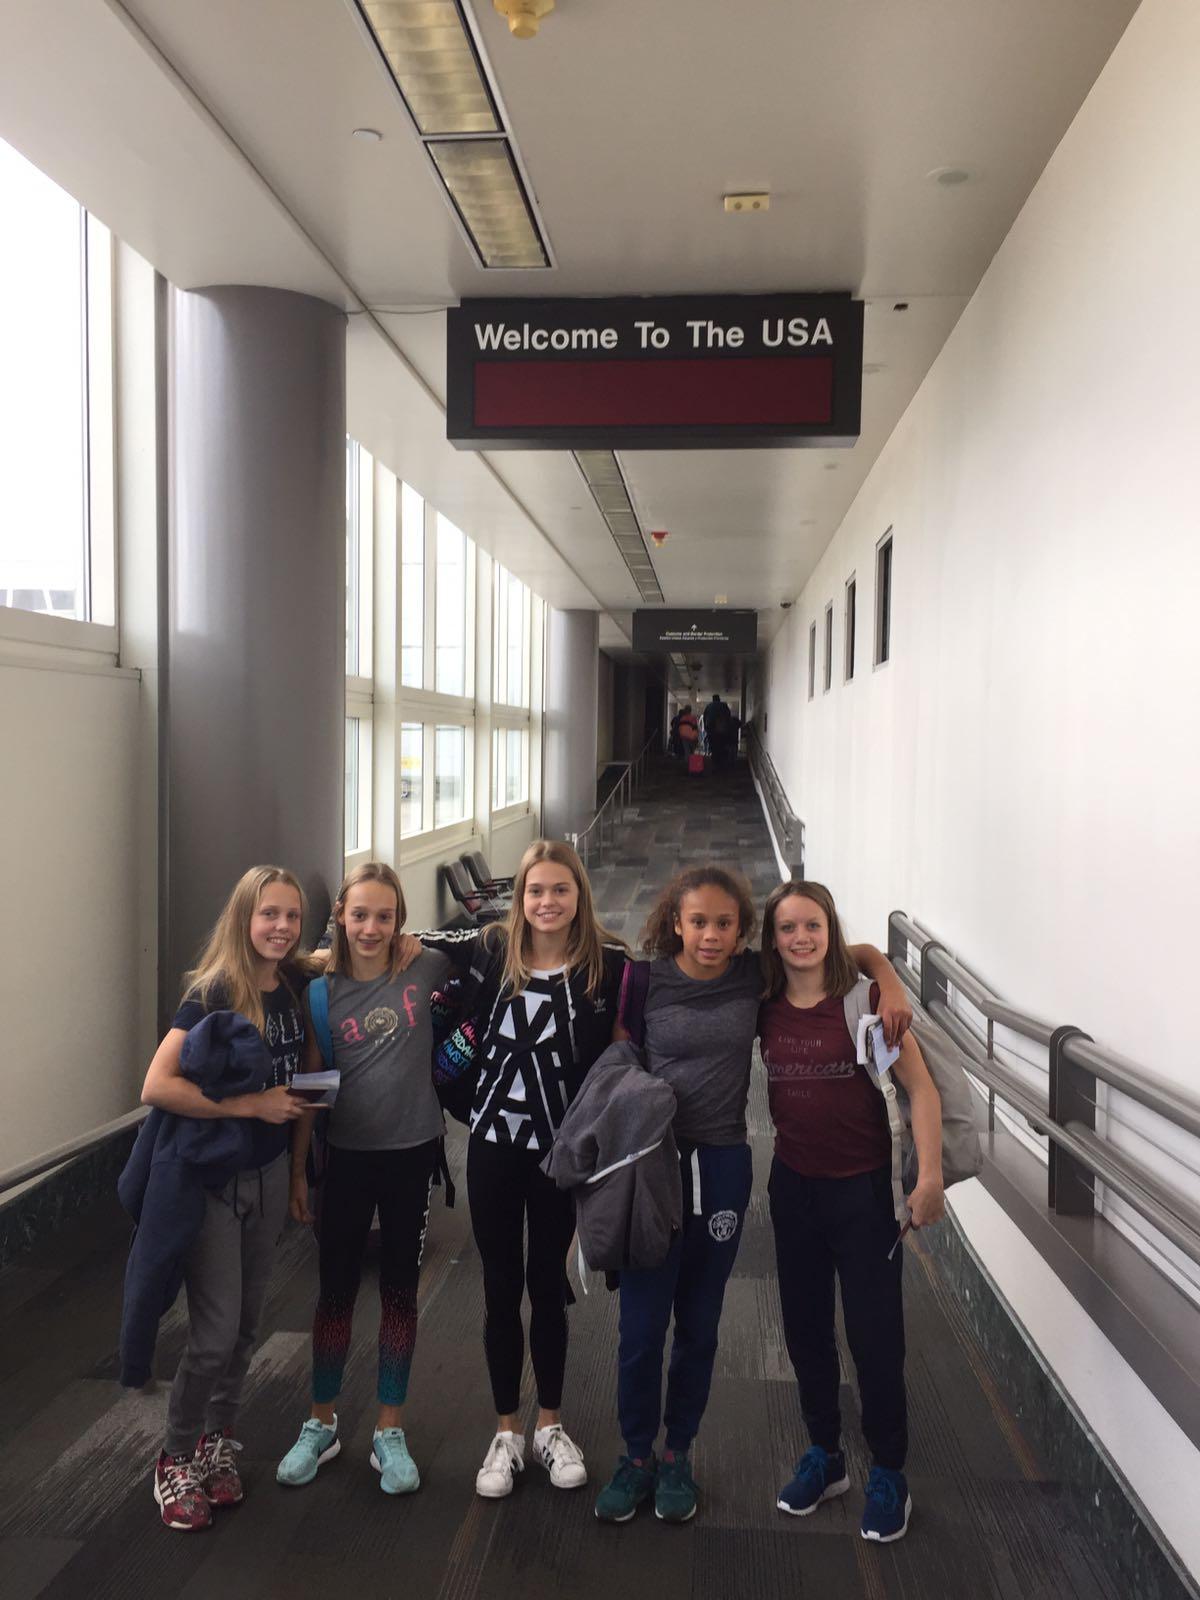 Laura de Witt 2016 USA Houston Airport